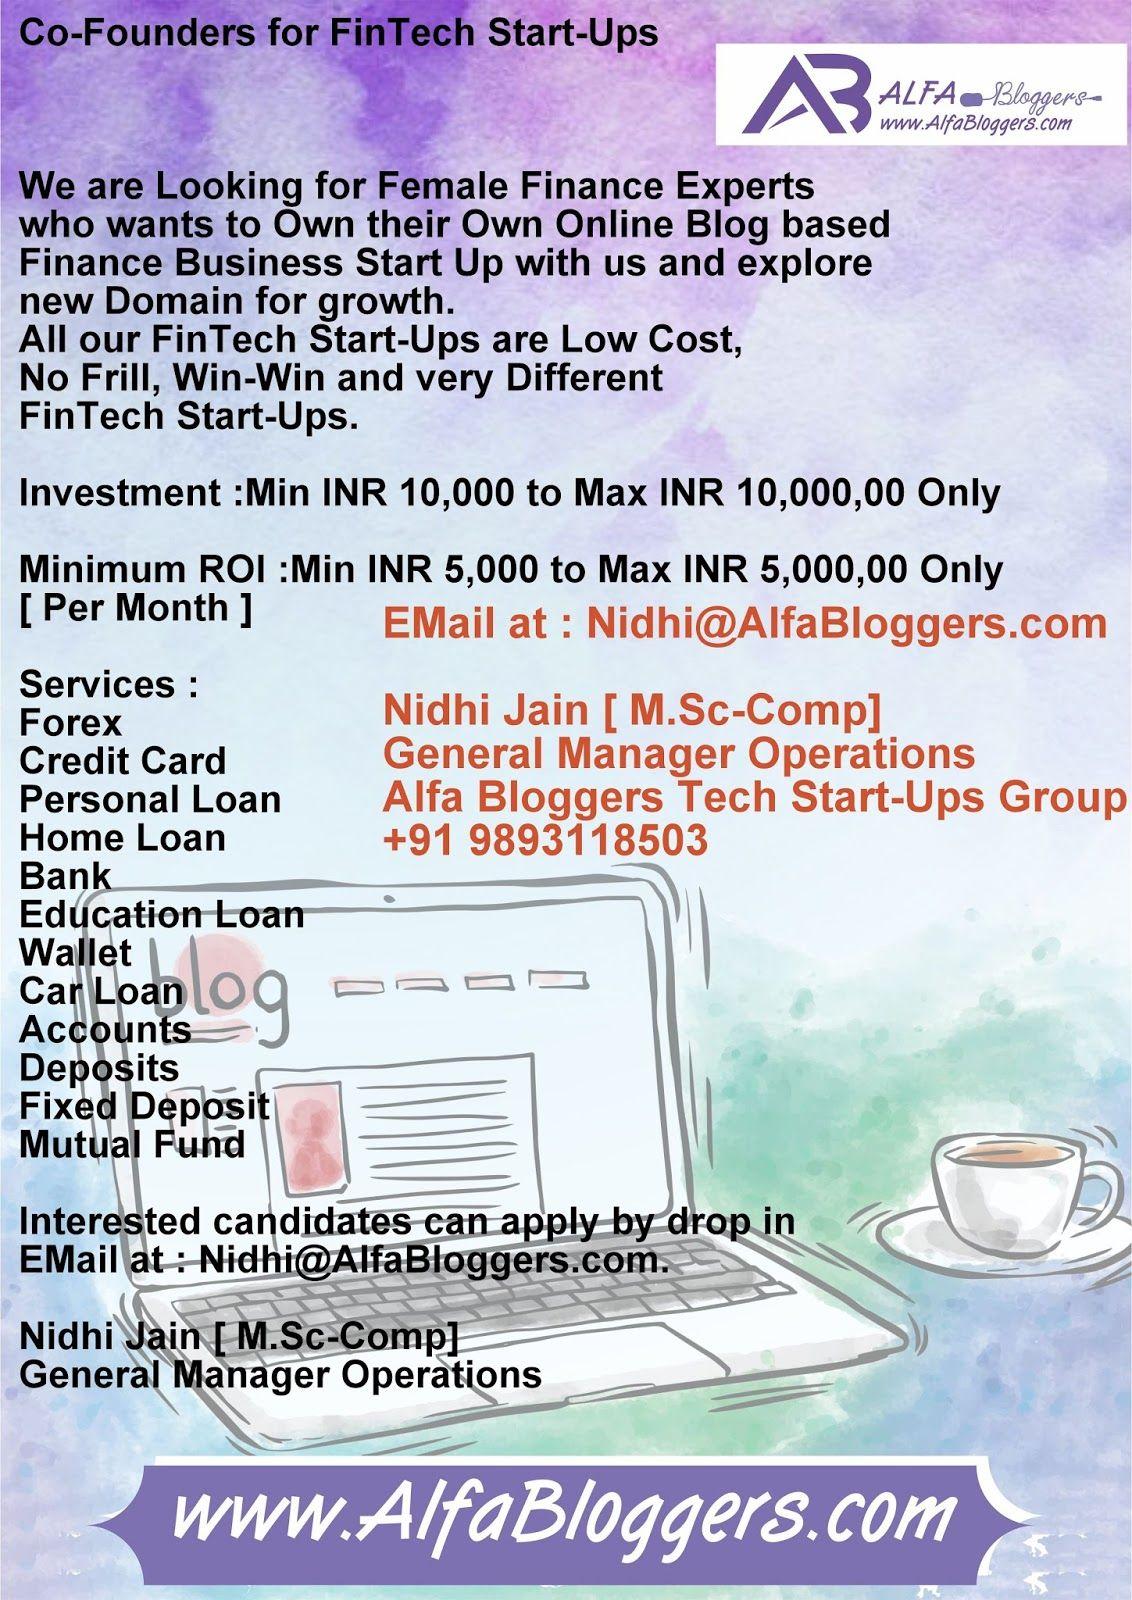 Co Founders For Fintech Start Ups Www Alfabloggers Com 2017 10 Co Founders For Fintech Start Ups Html We Are Looking Fo Fintech Startups Fintech Financial Tips